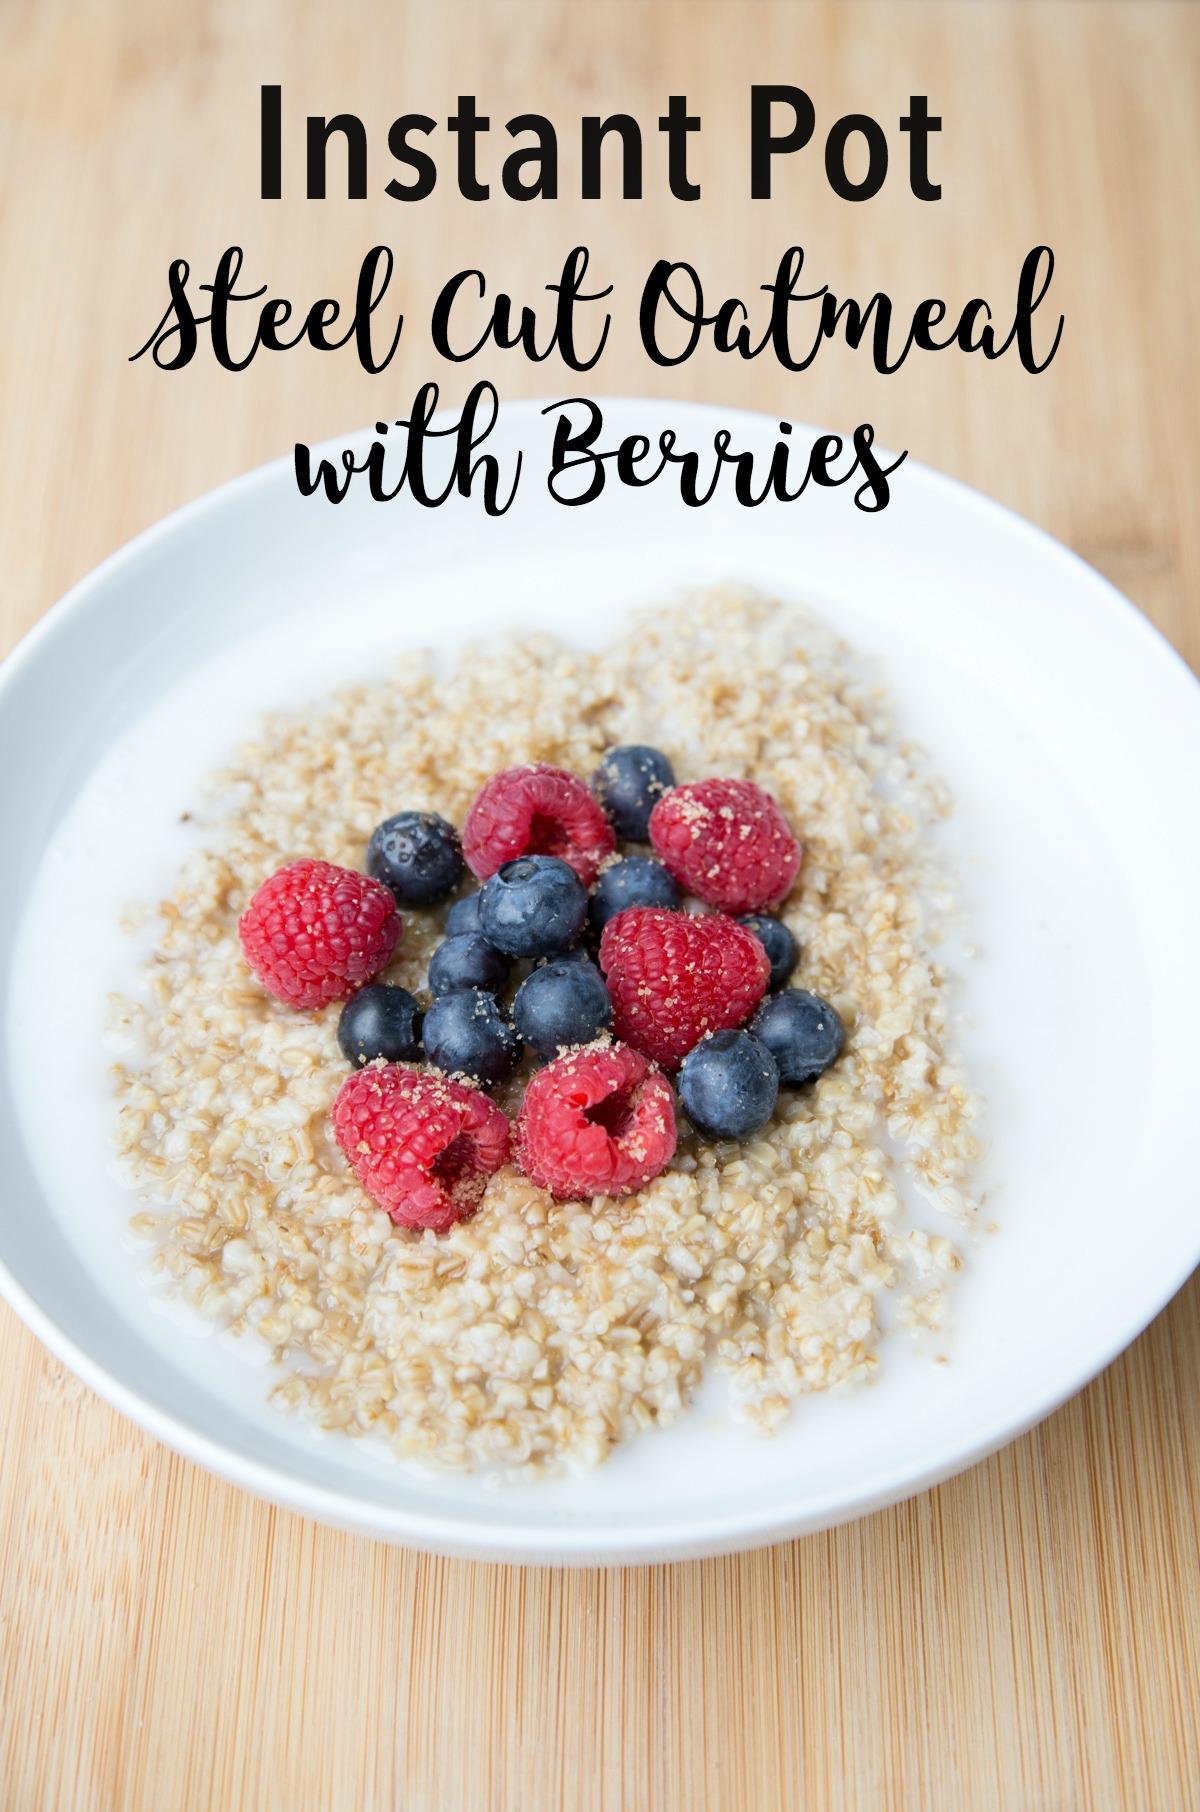 instant-pot-steel-cut-oats-with-berries-on-5dollardinners-com